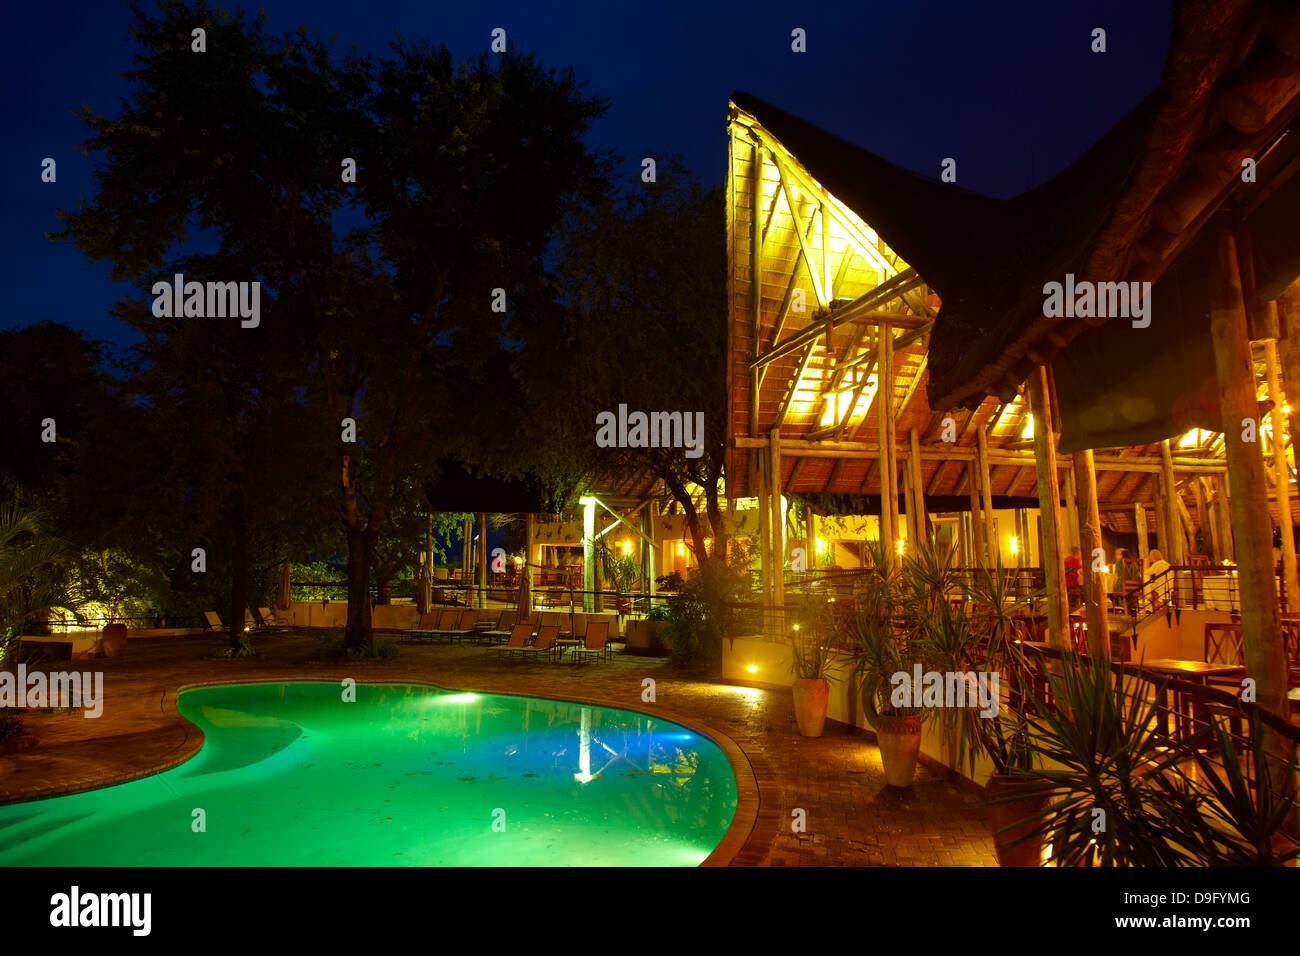 Swimming pool at dusk, Chobe Safari Lodge, Kasane, Botswana, Africa - Stock Image